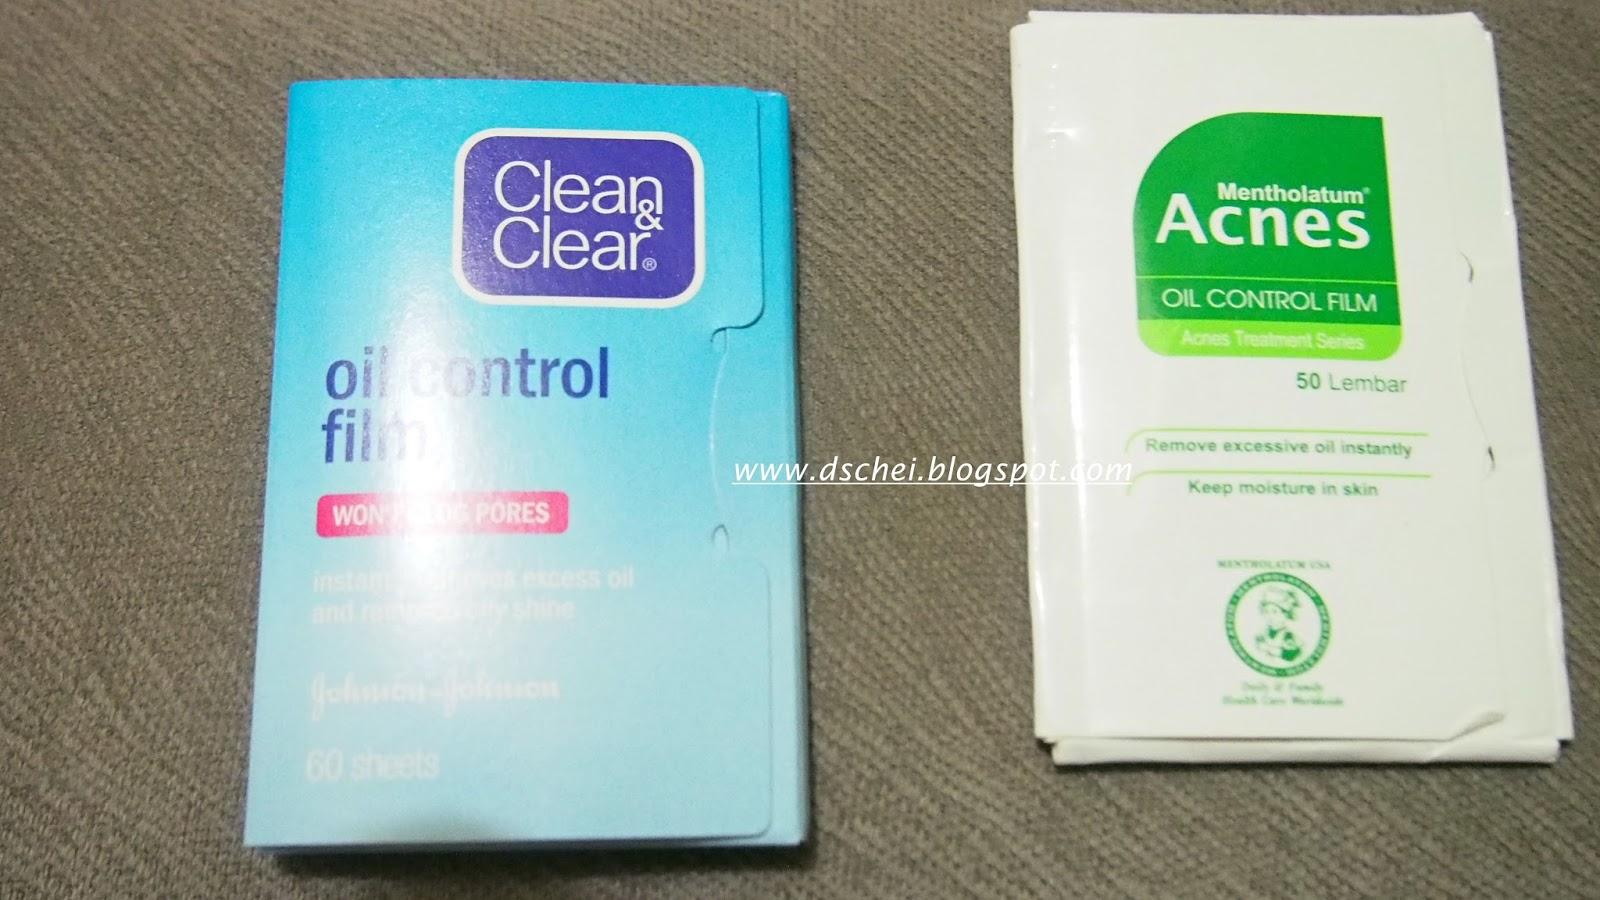 Dscheiii Review Acnes Oil Control Film Cleanclear Oil Control Film